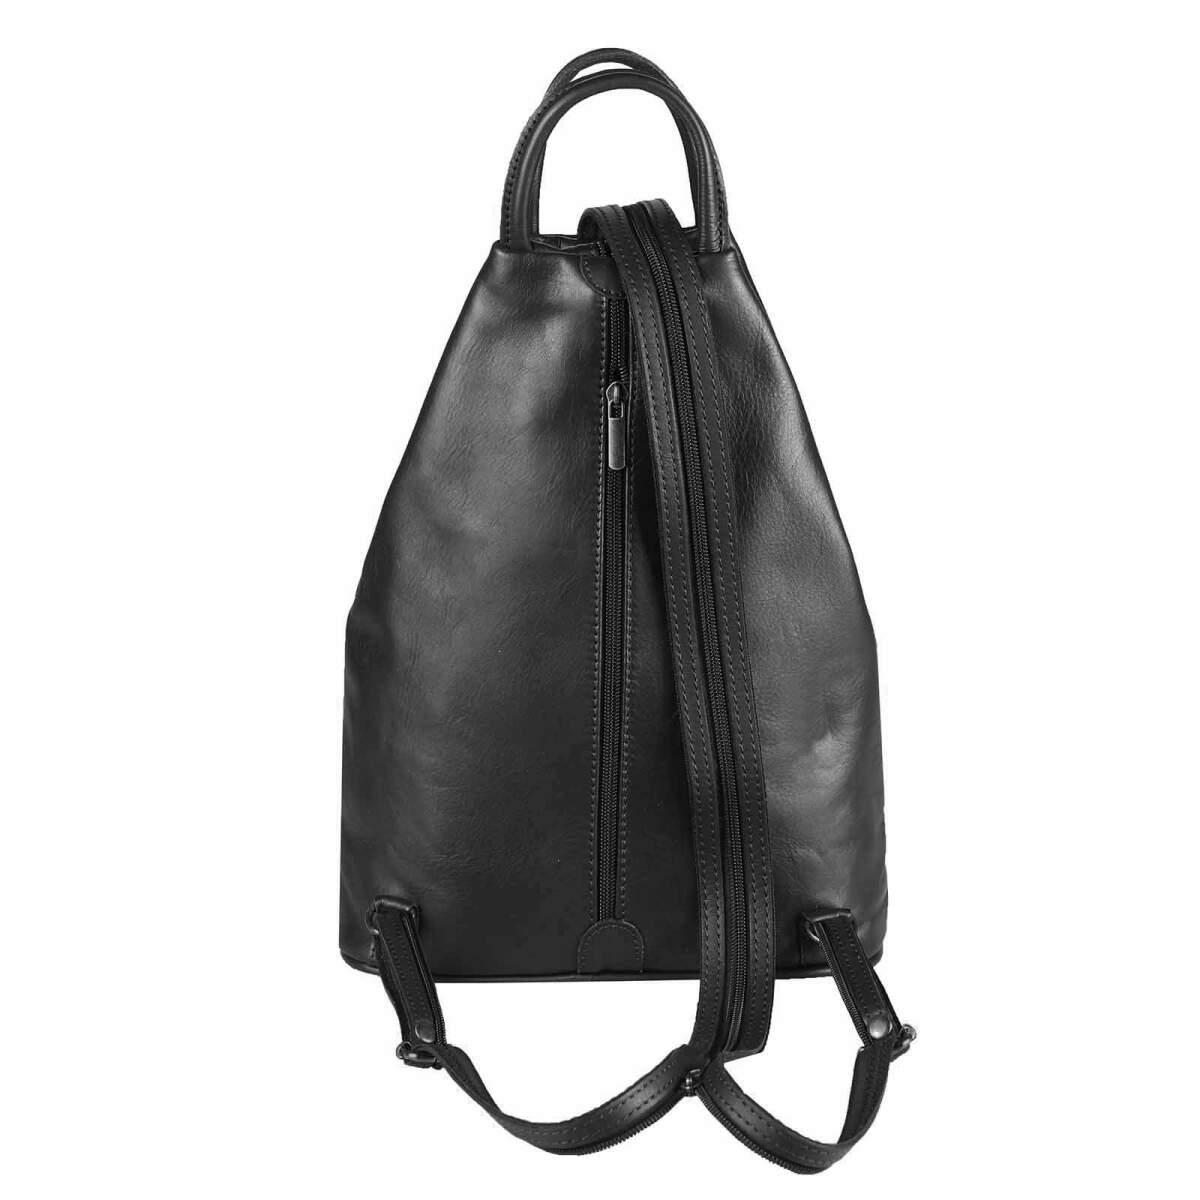 obc damen echt leder rucksack schultertasche schwarz 69 95. Black Bedroom Furniture Sets. Home Design Ideas